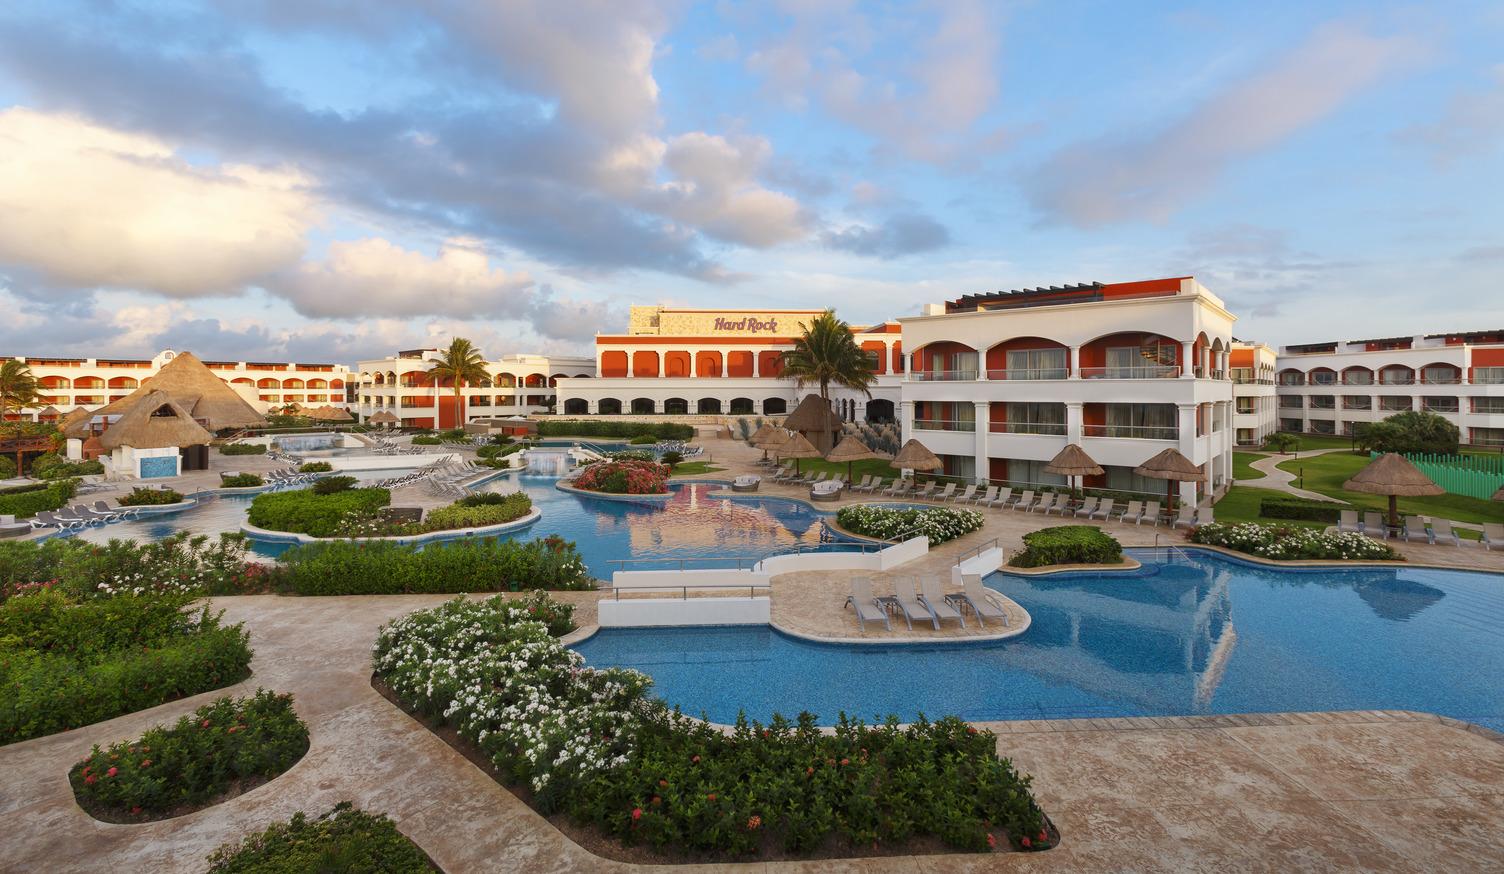 Travel Agency All-Inclusive Resort Heaven at Hard Rock Hotel Riviera Maya 01